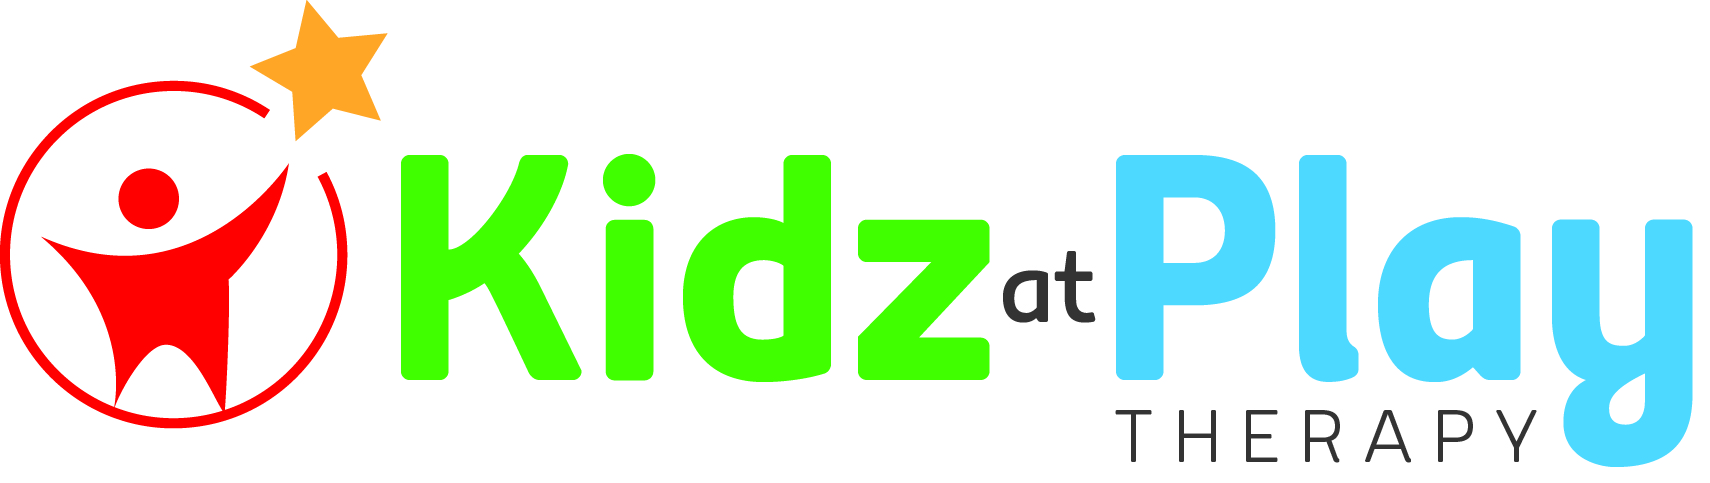 Kidz at Play Therapy PLLC